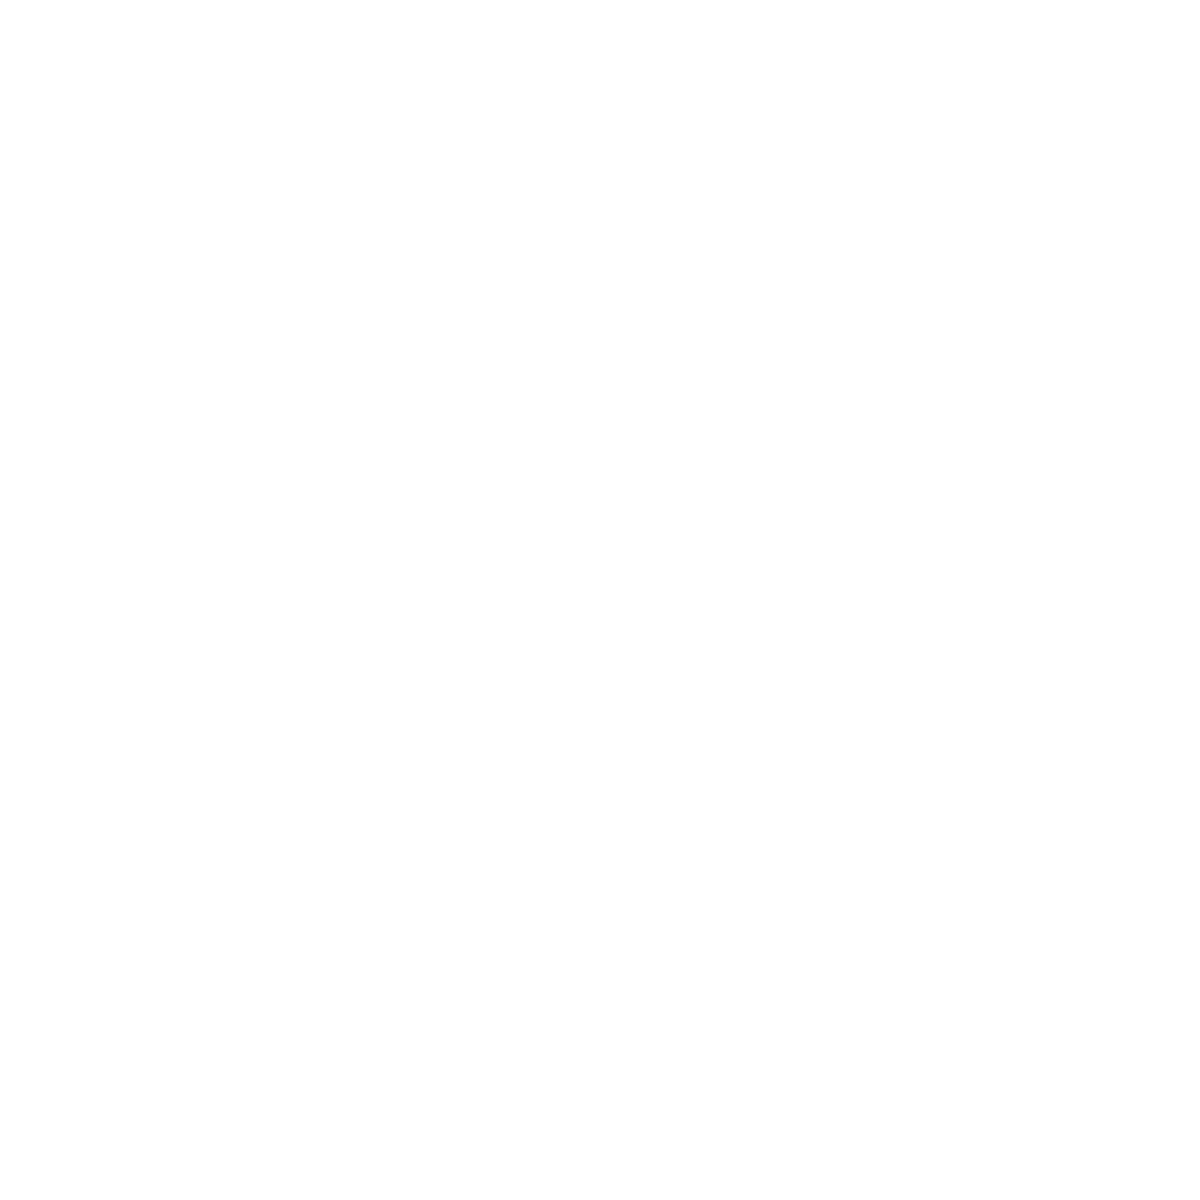 Dai Bugatti